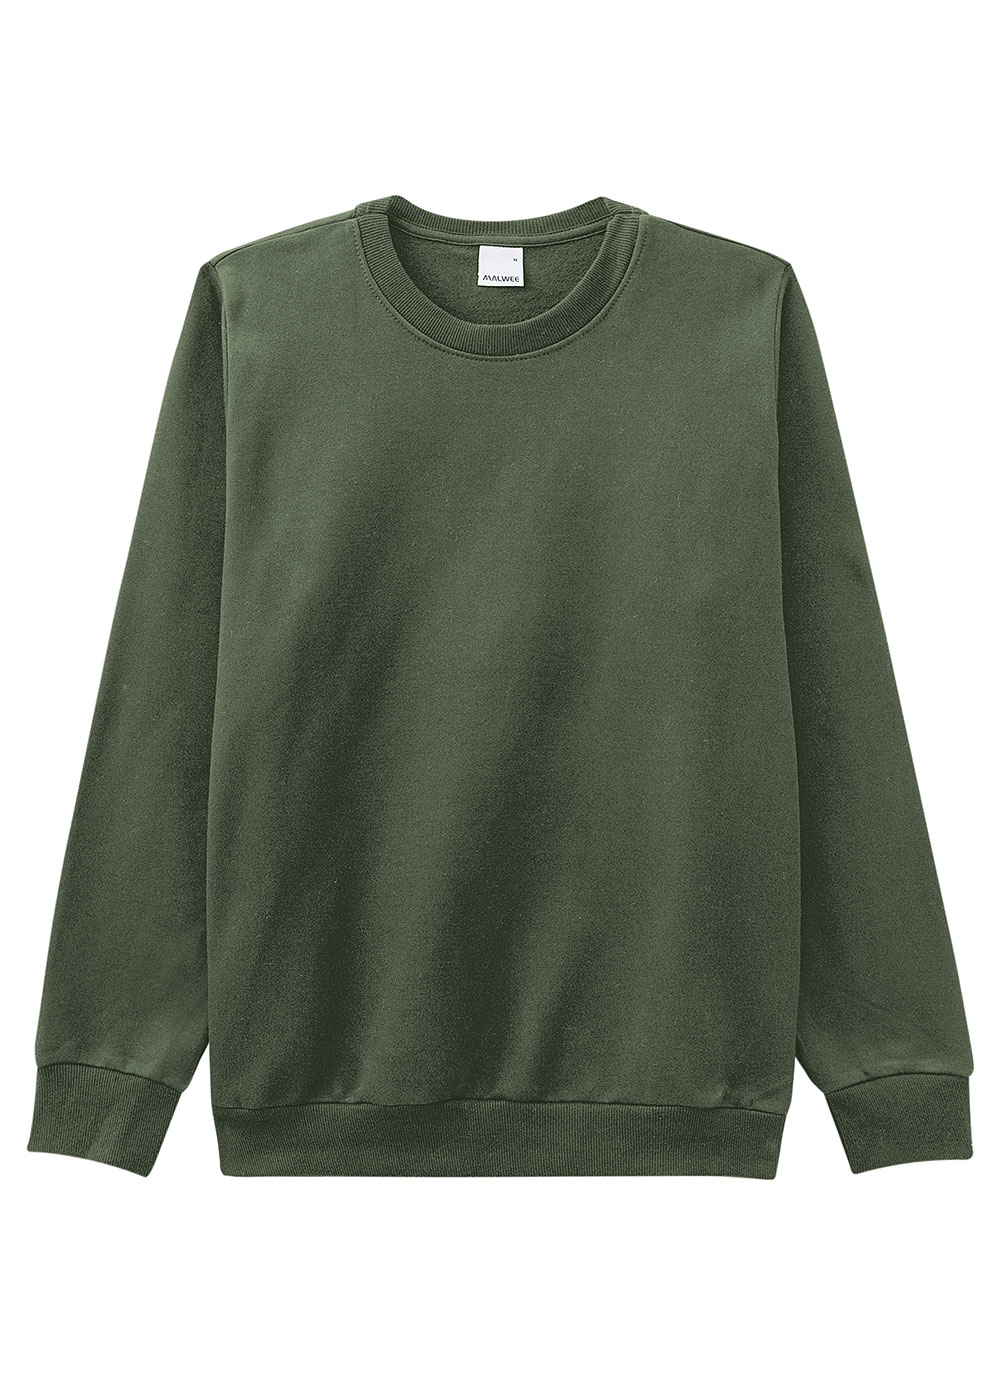 Casaco/Blusão ADULTO Masculino Inverno Verde Malwee